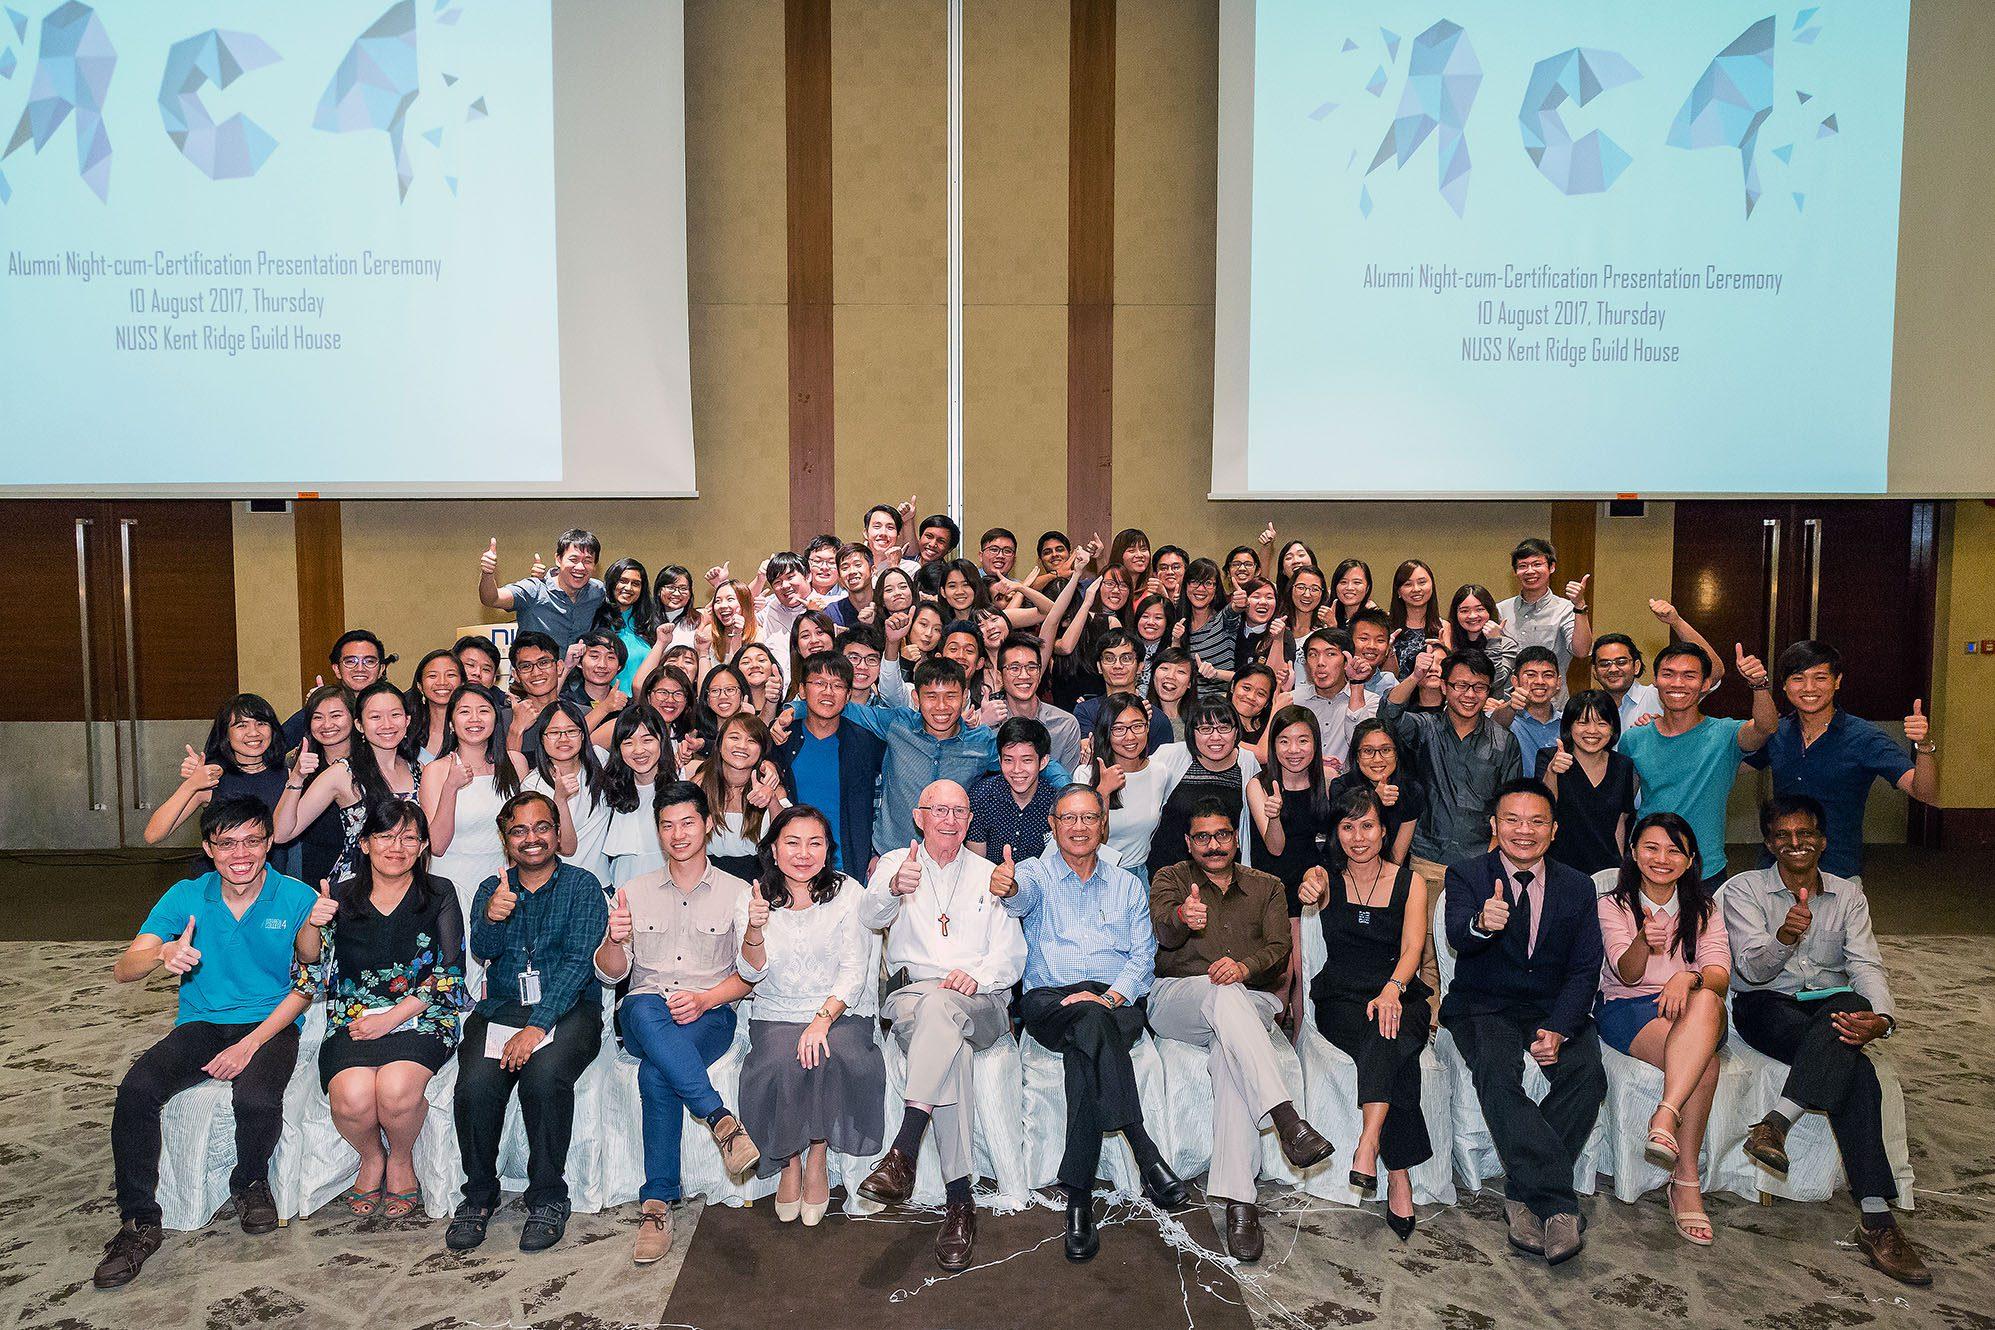 Alumni Night-cum-Certificate Presentation Ceremony 2017